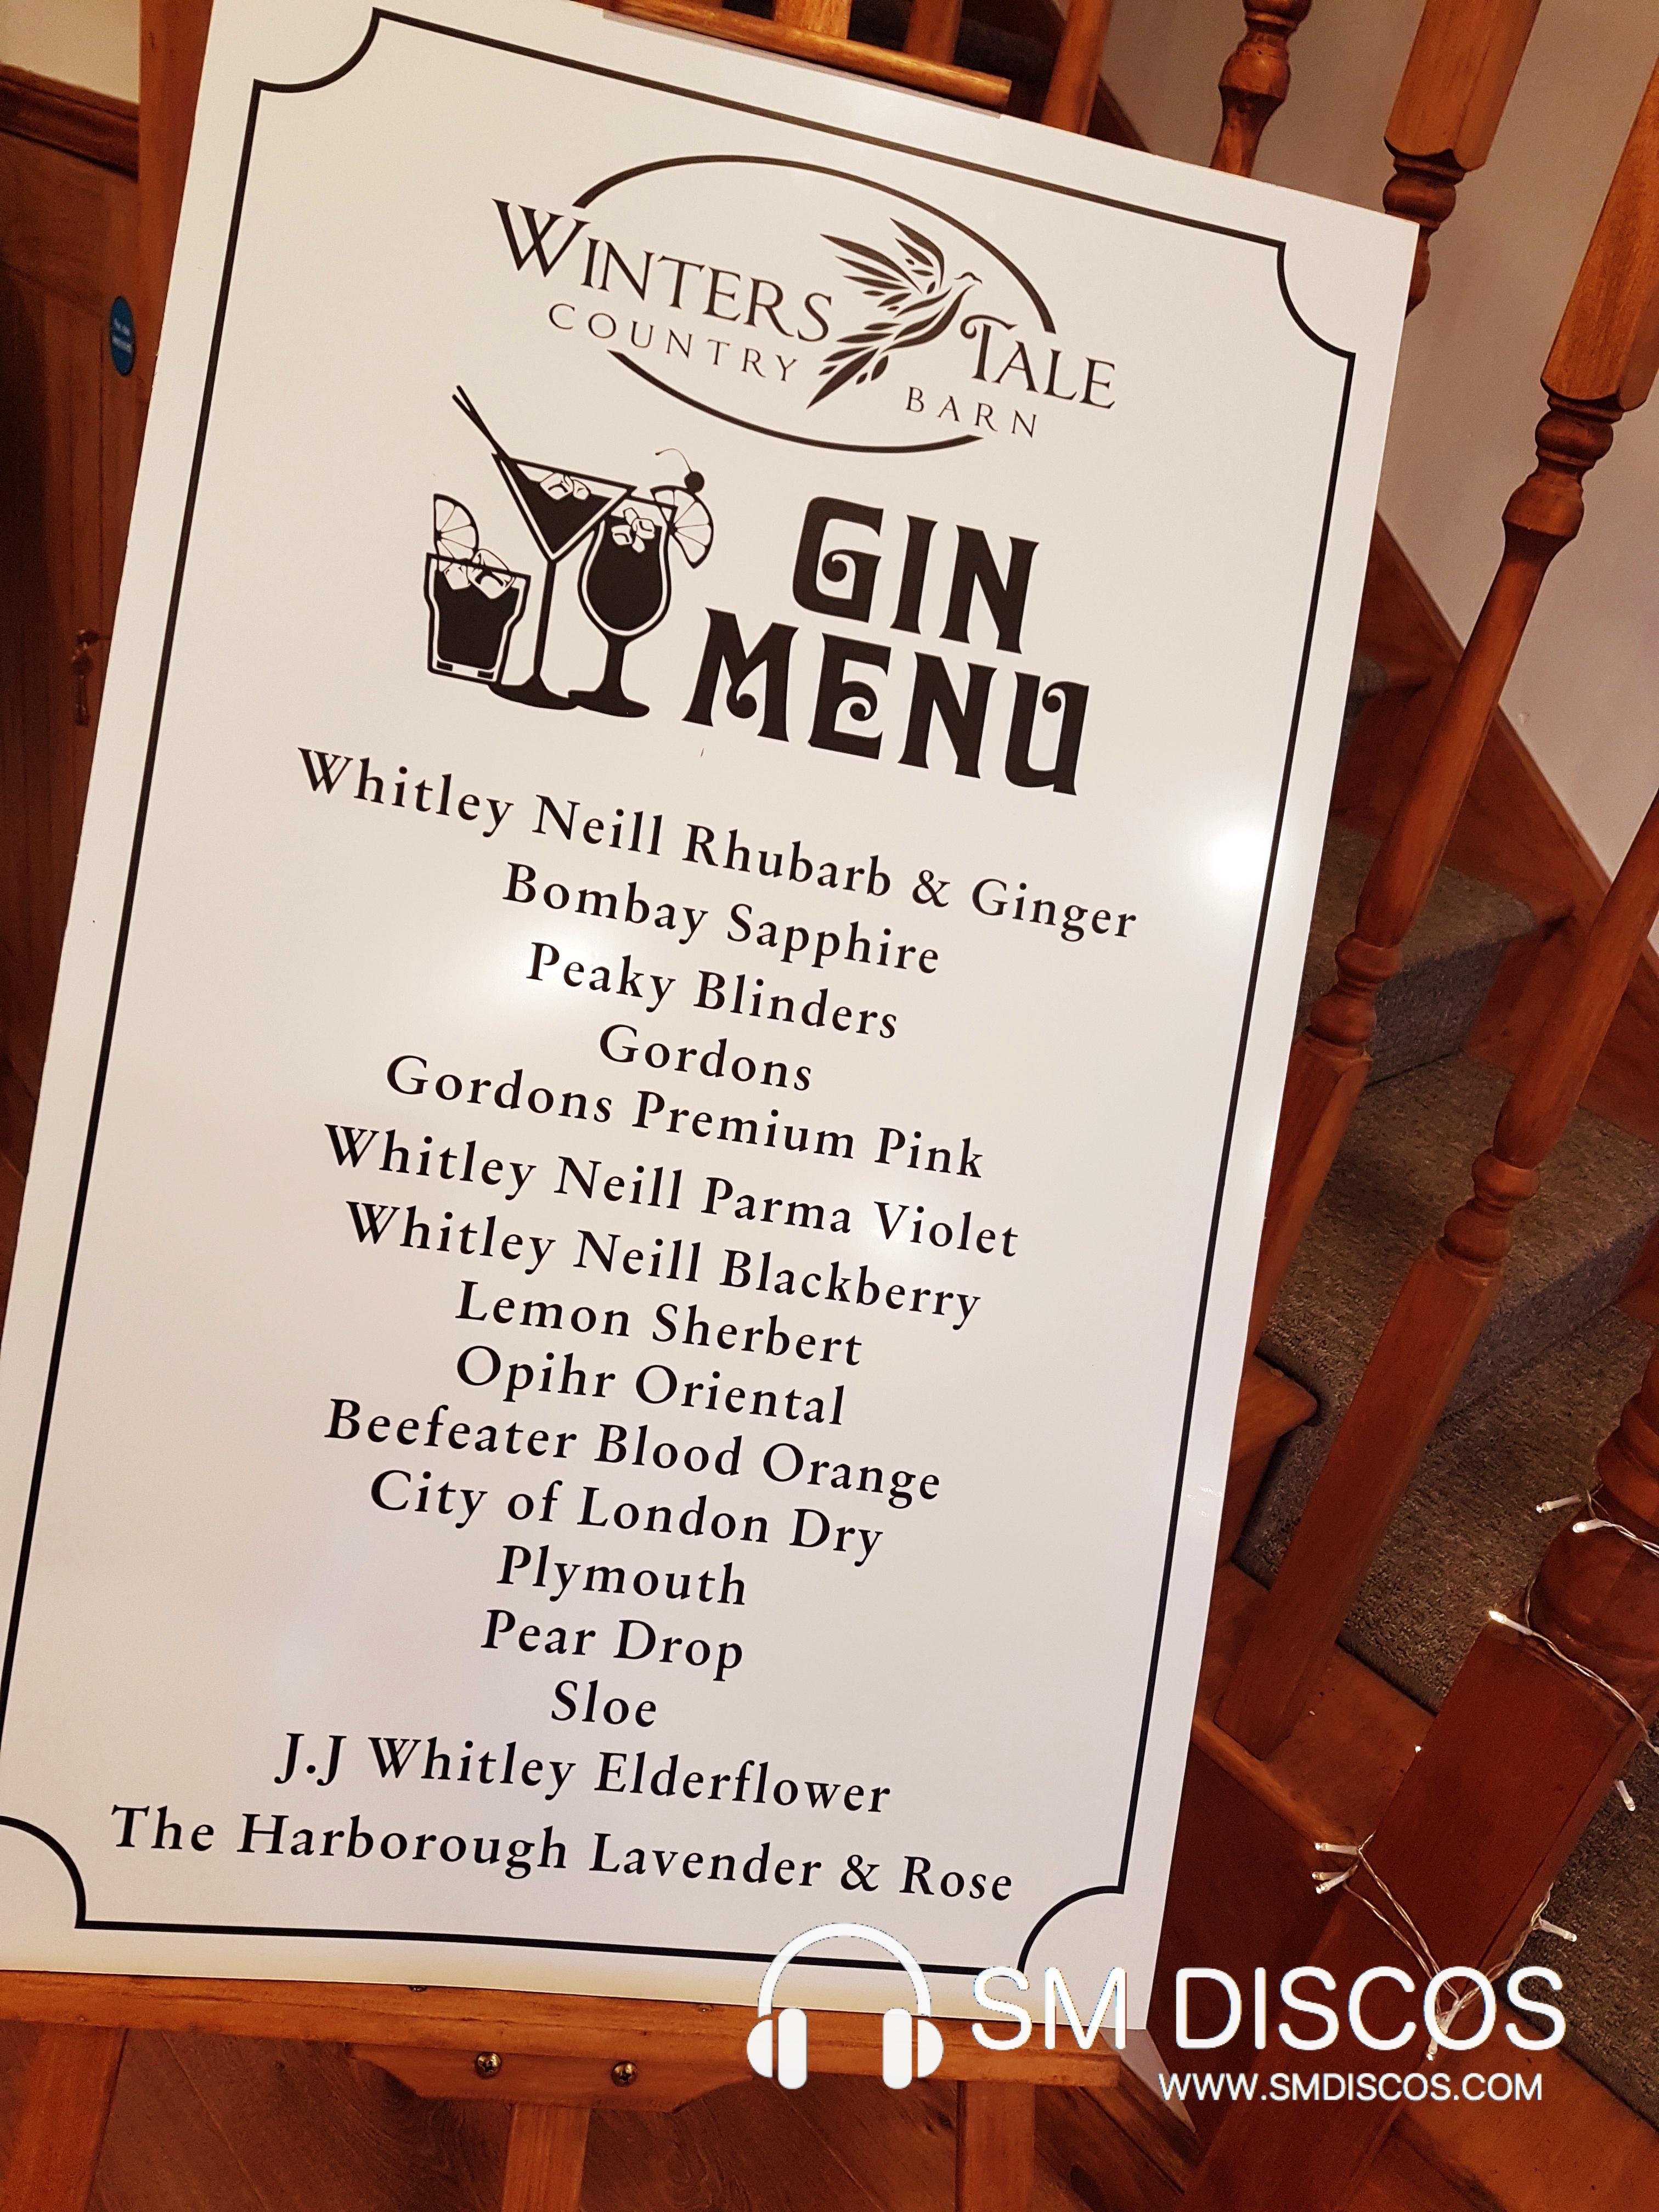 Gin menu at Winters Tale Country Barn